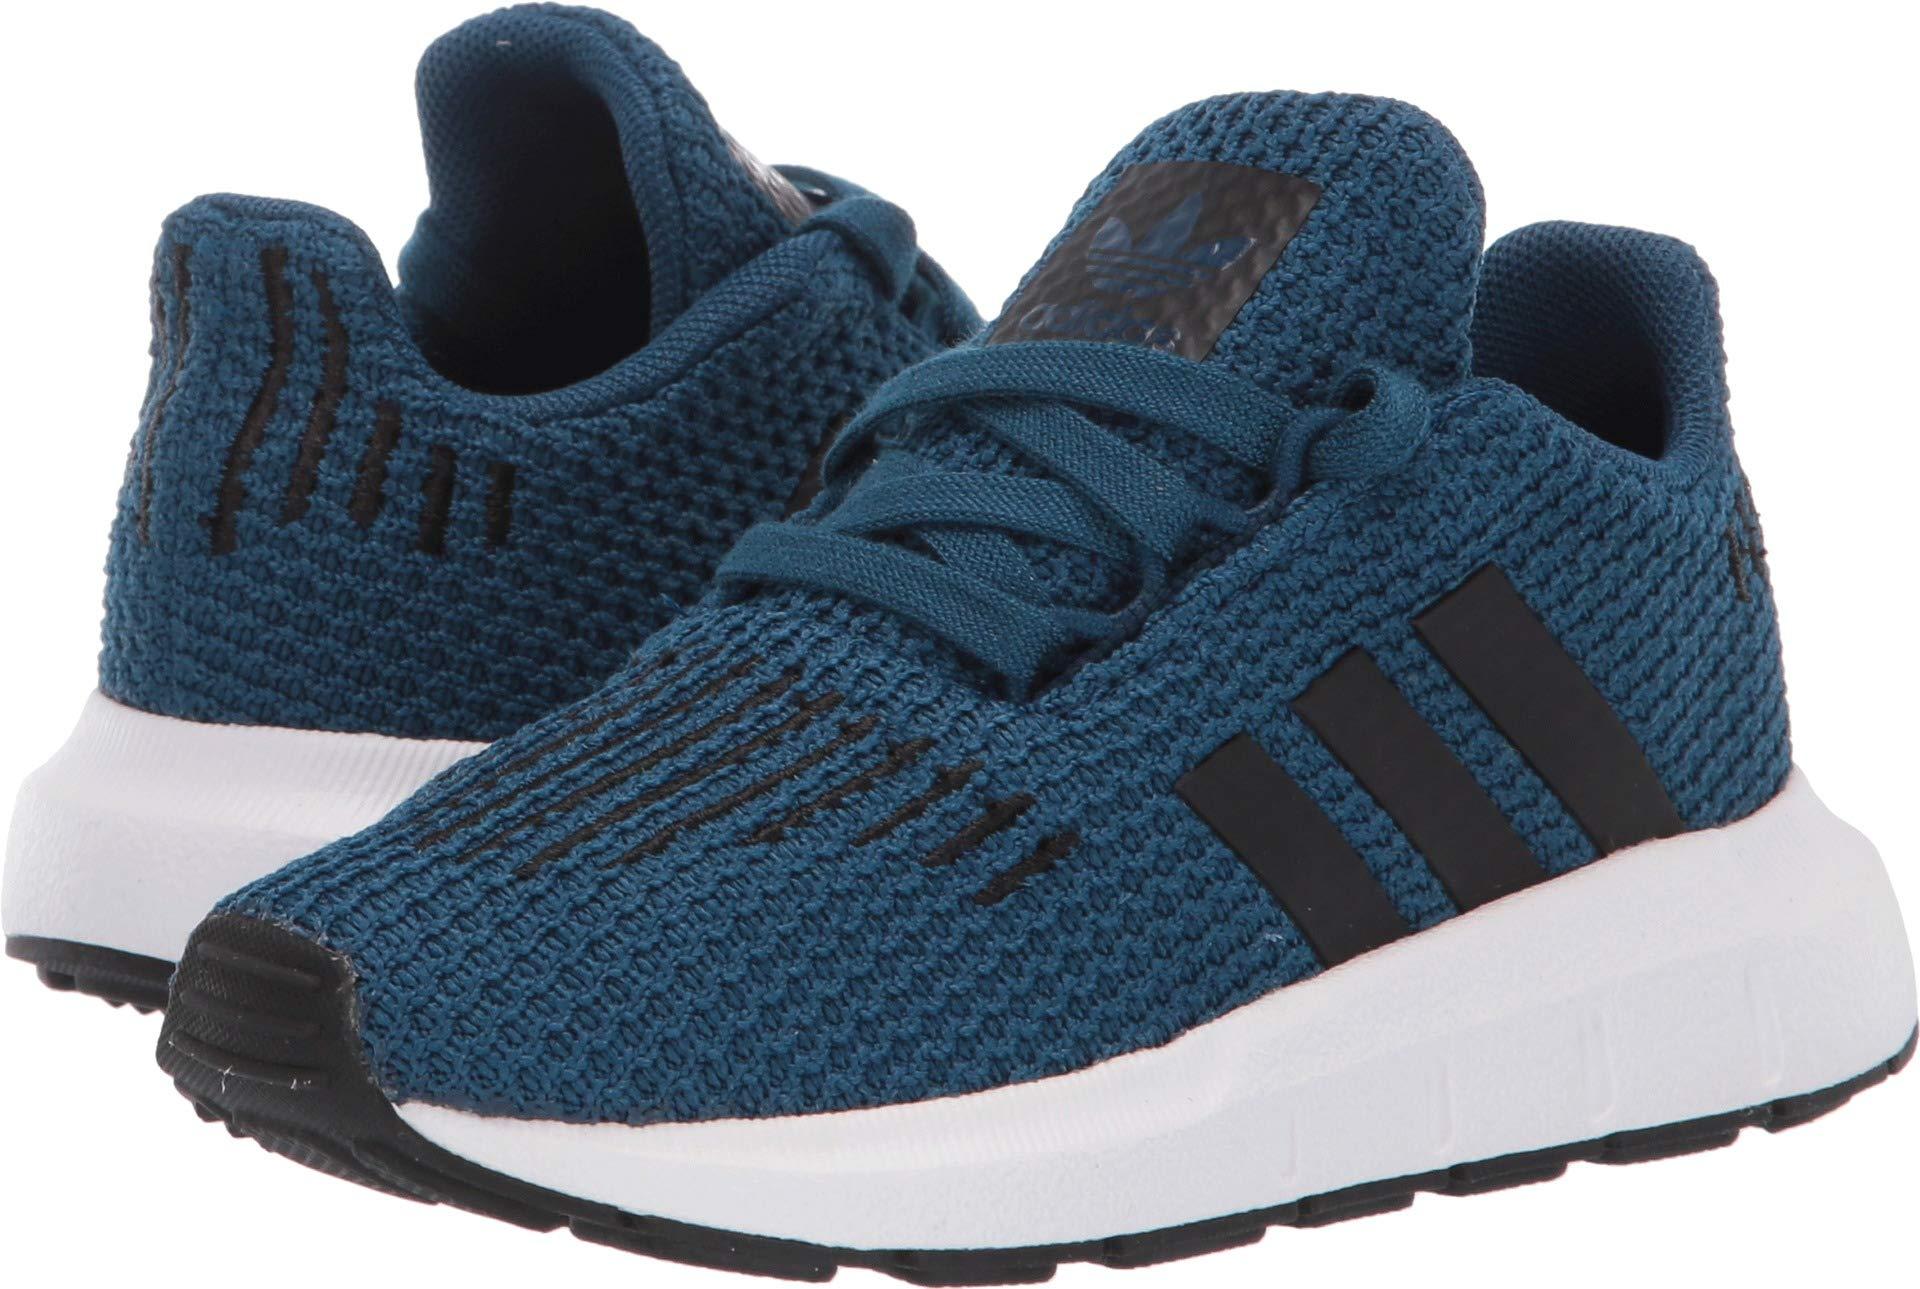 c0fbd7fe4a3f4 Galleon - Adidas Originals Baby Swift Running Shoe